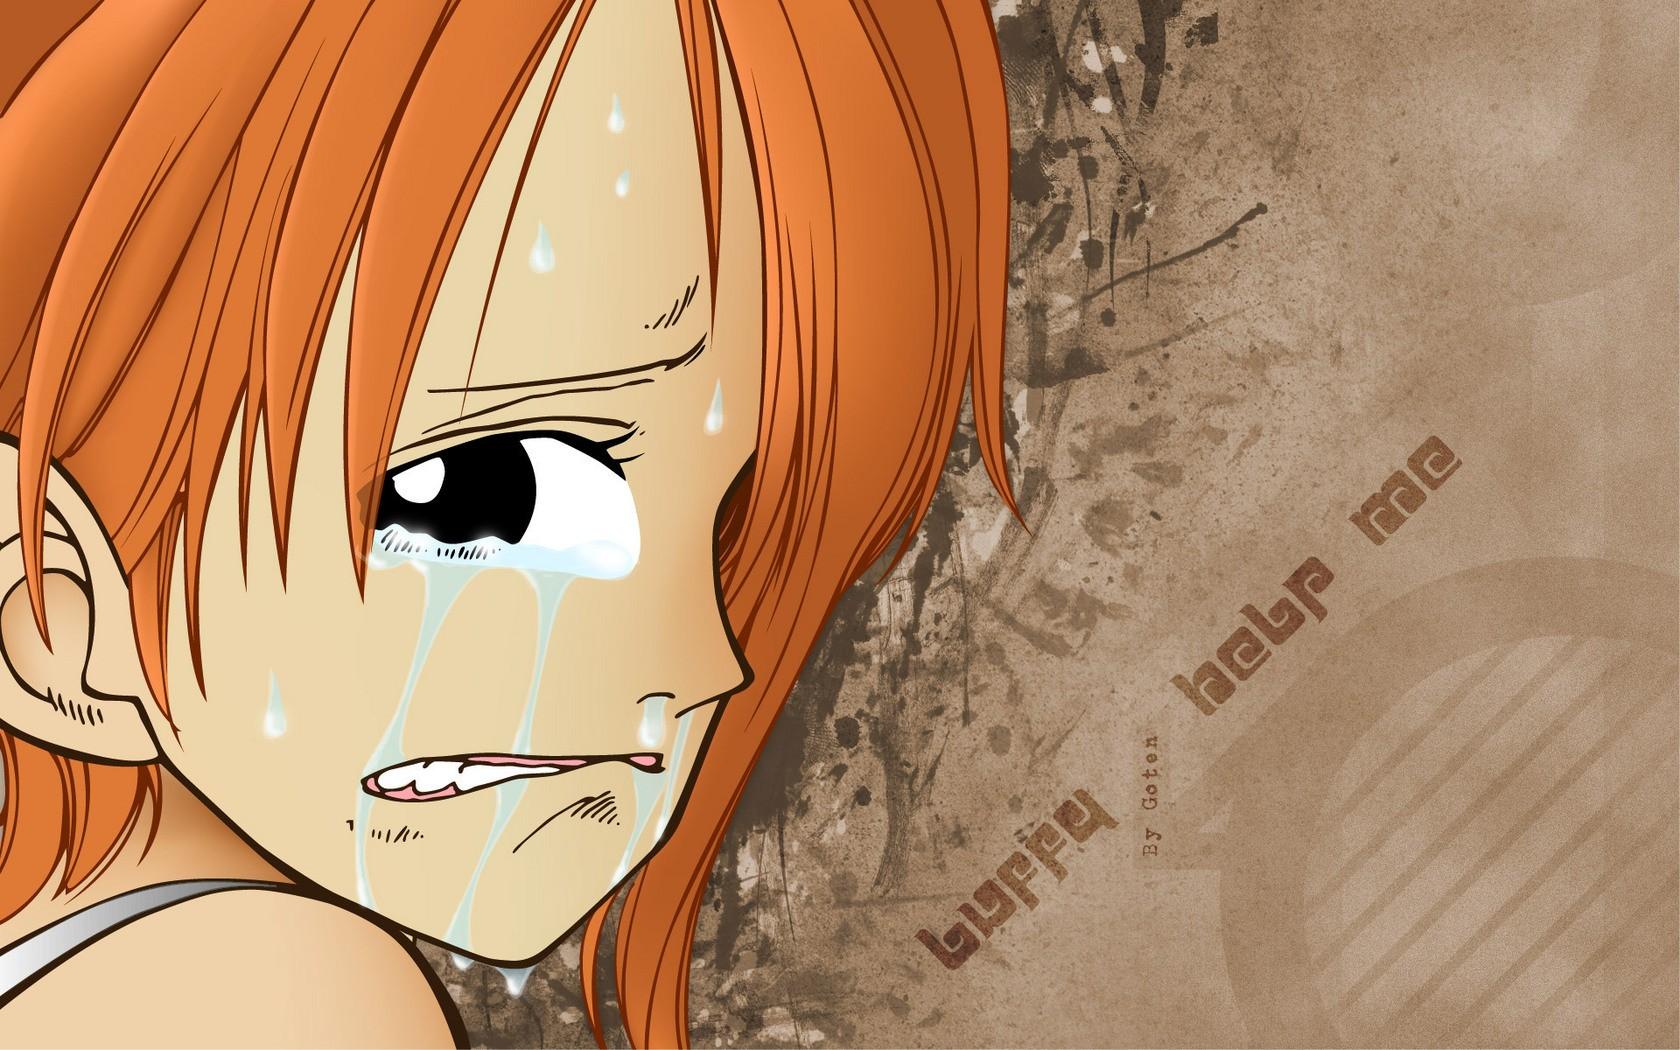 Wallpaper Drawing Illustration Anime Cartoon One Piece